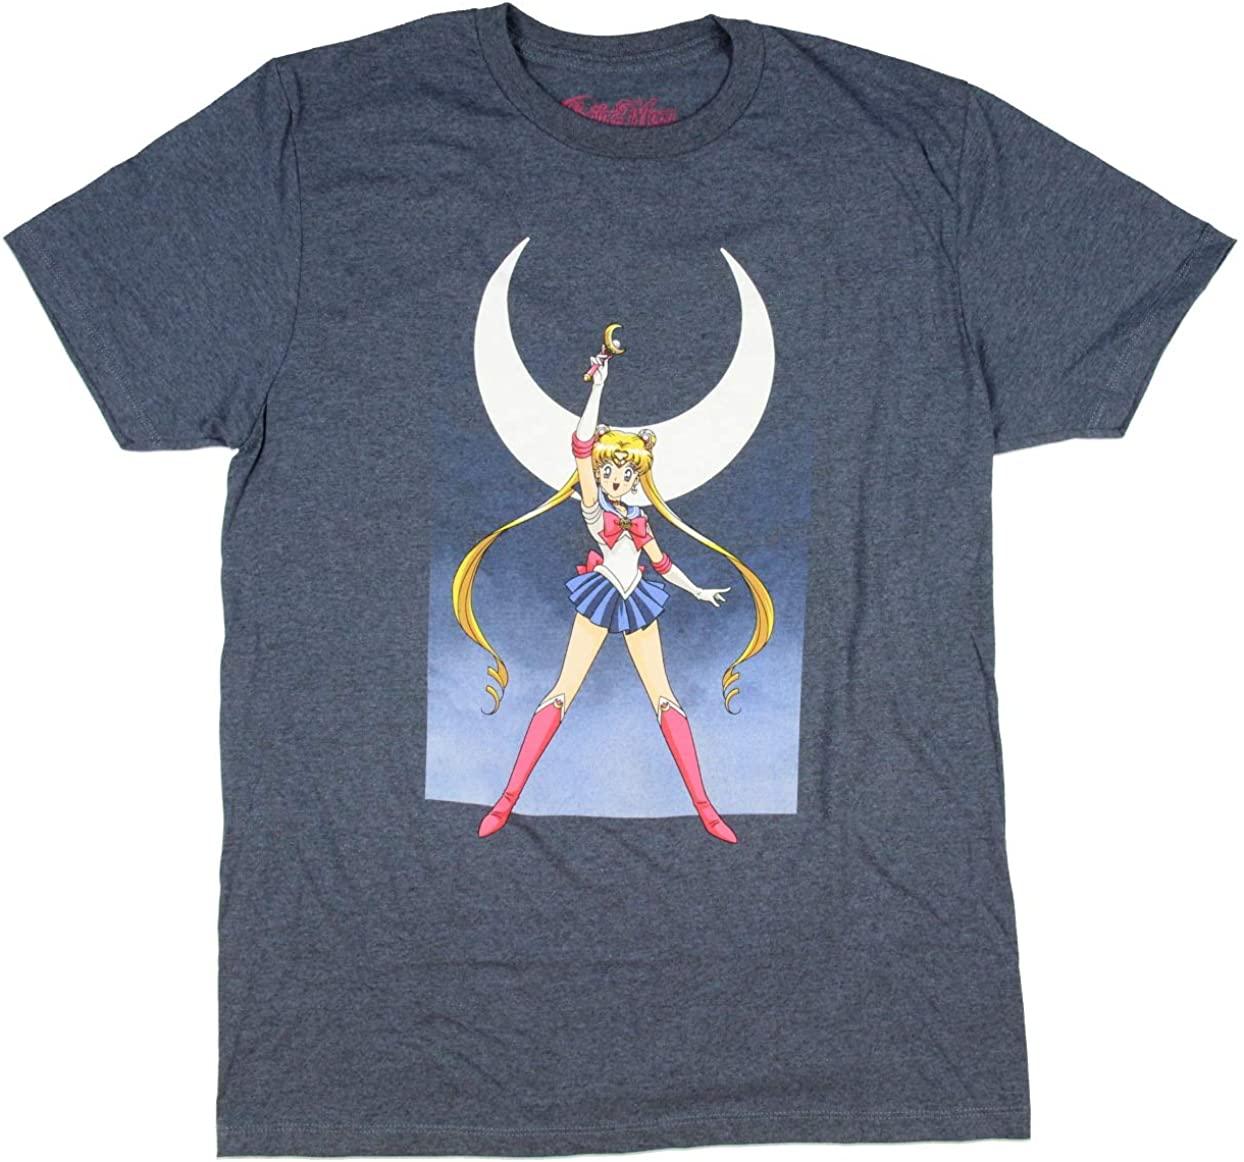 Sailor Moon Men's Anime Graphic T-Shirt